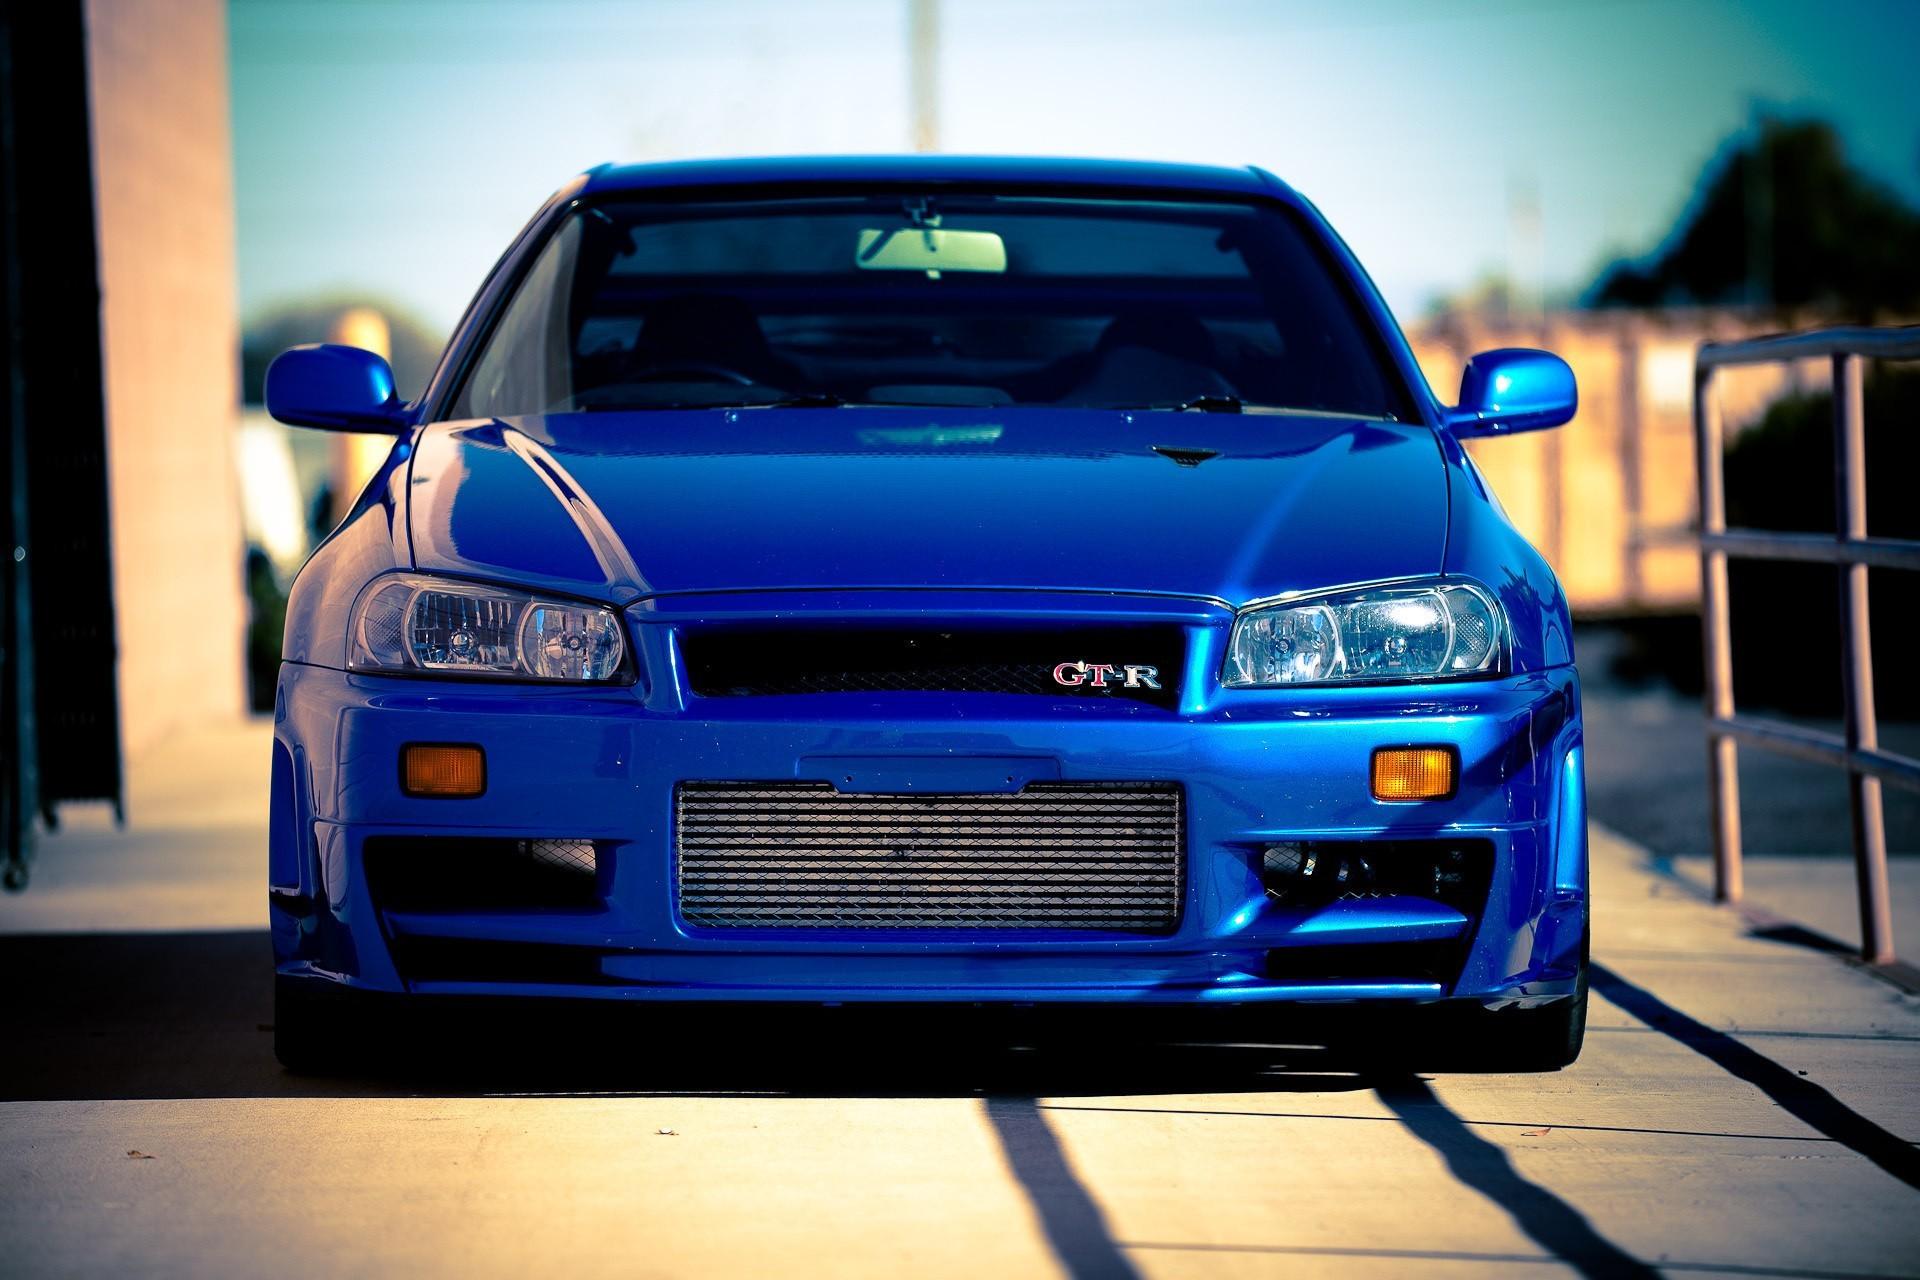 car, Nissan, Nissan GTR, Blue Cars Wallpapers HD / Desktop and Mobile  Backgrounds